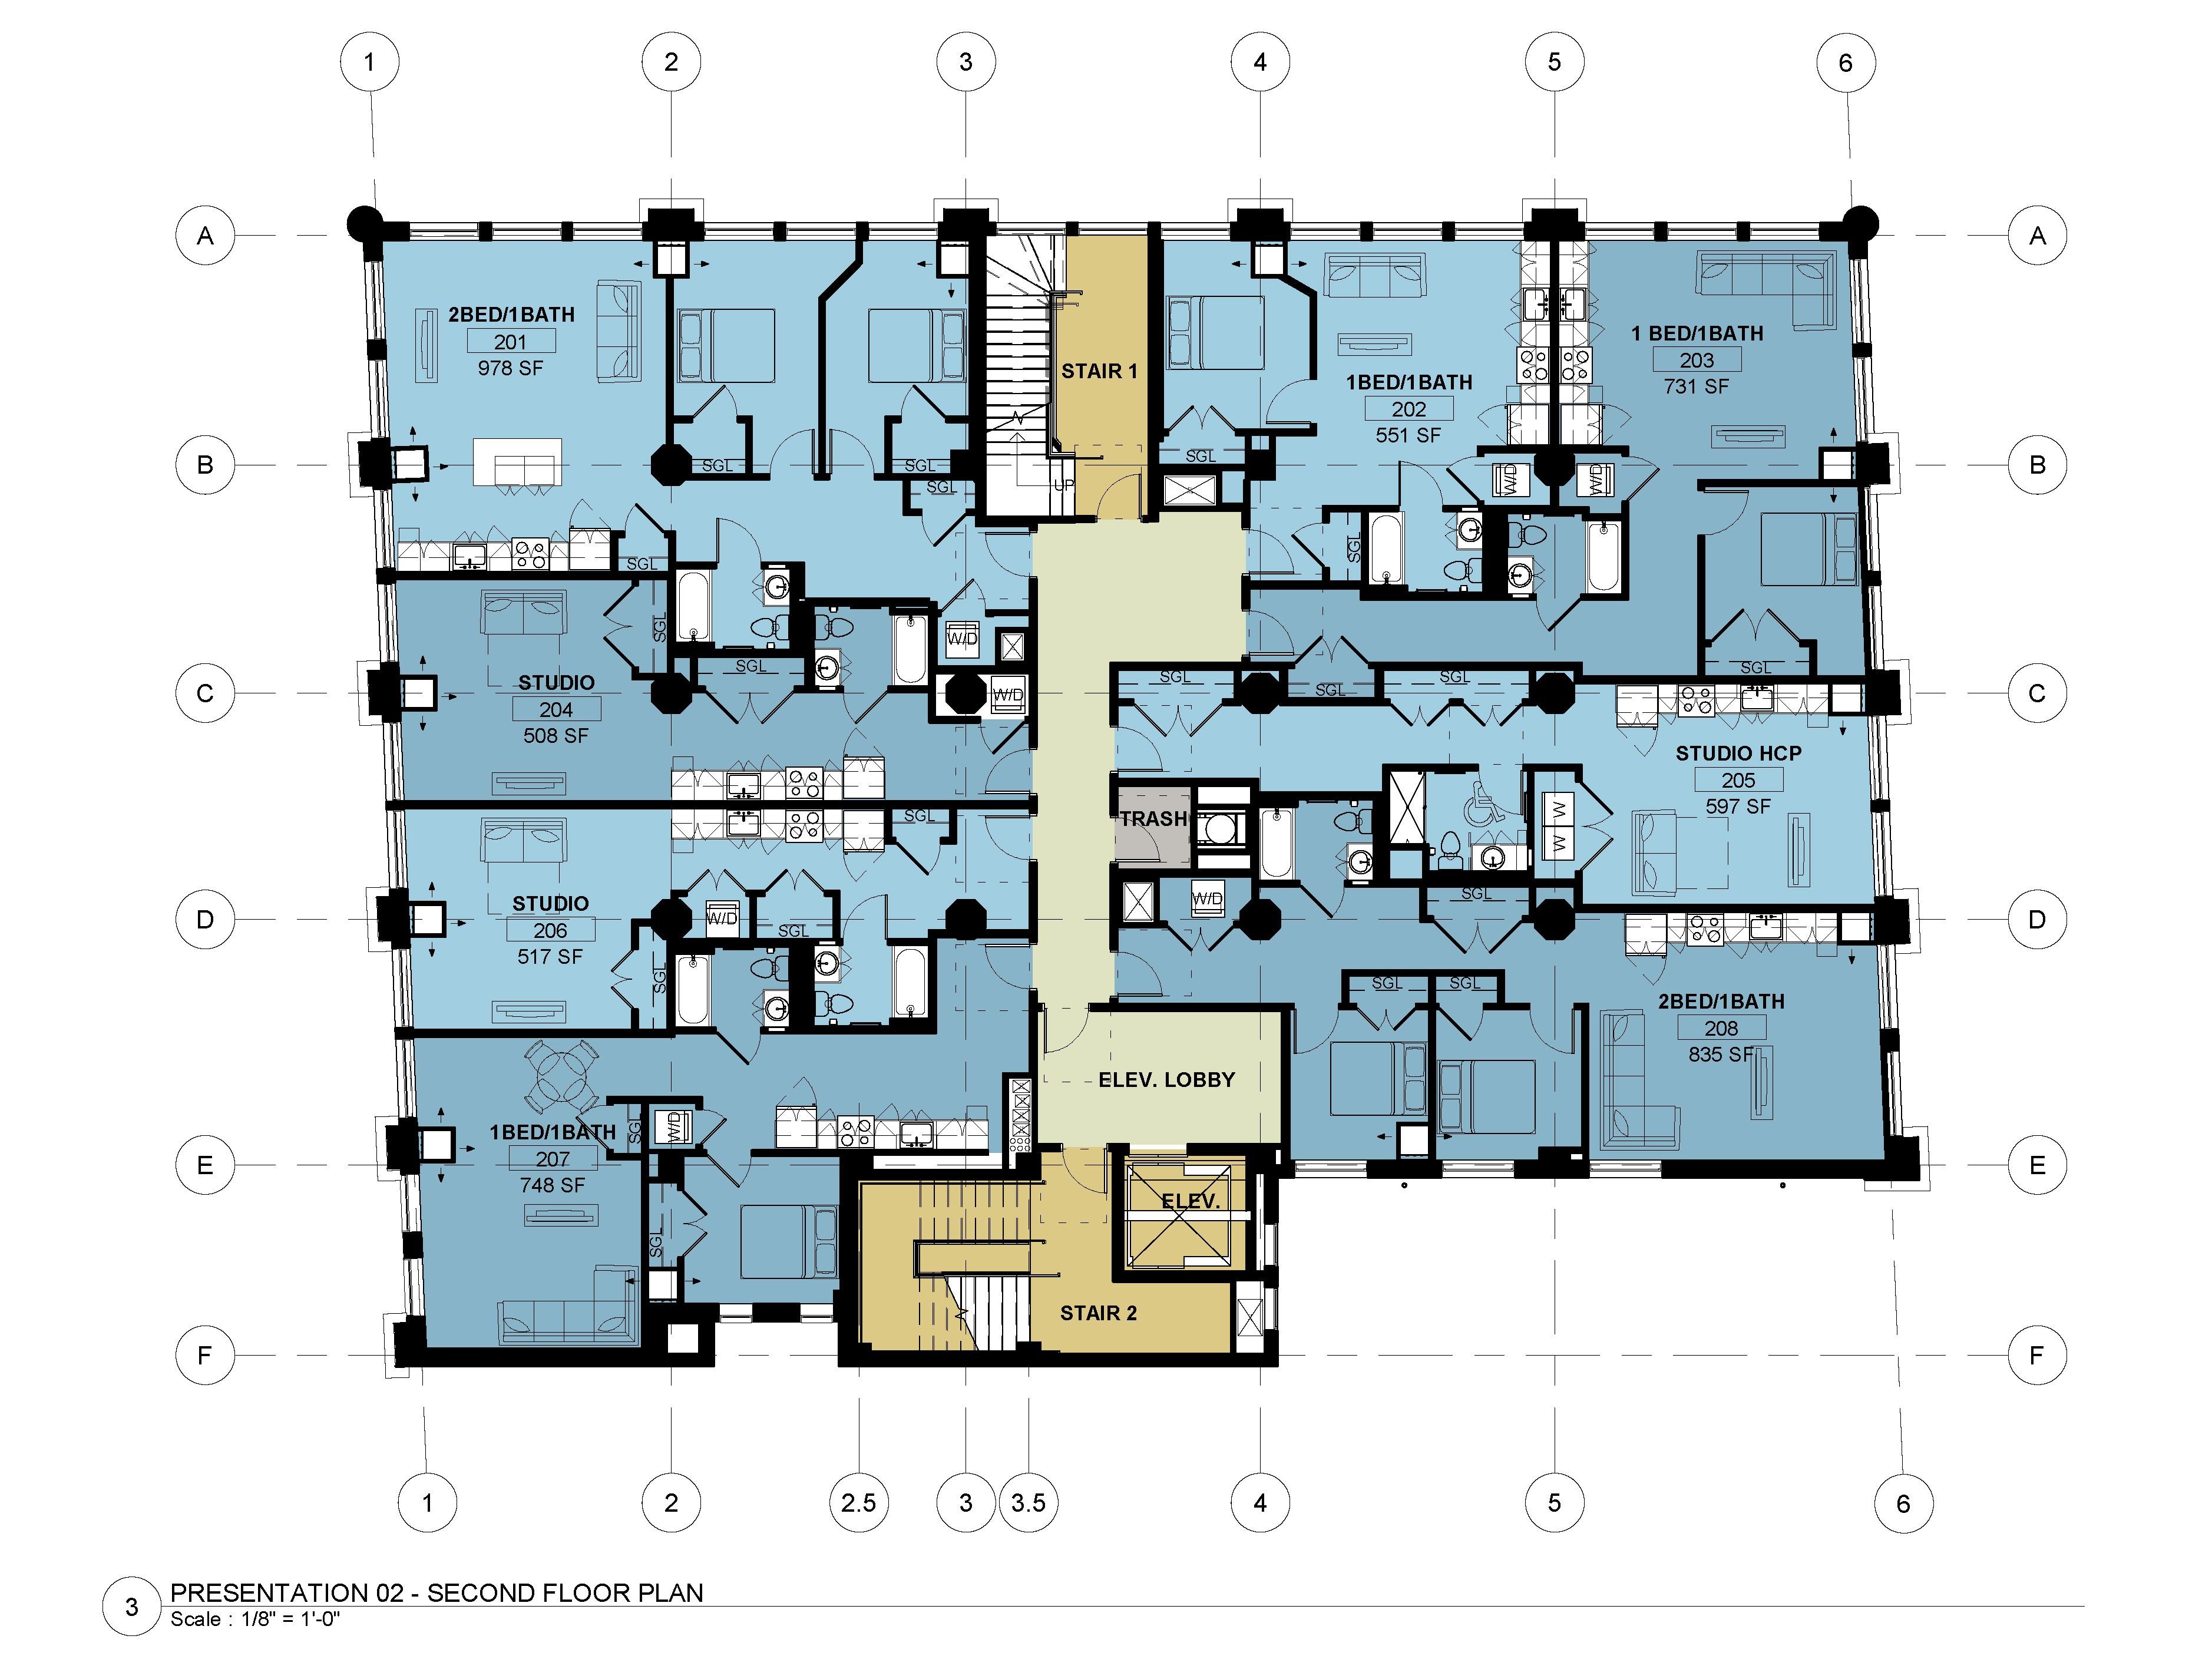 Second - Third Floors